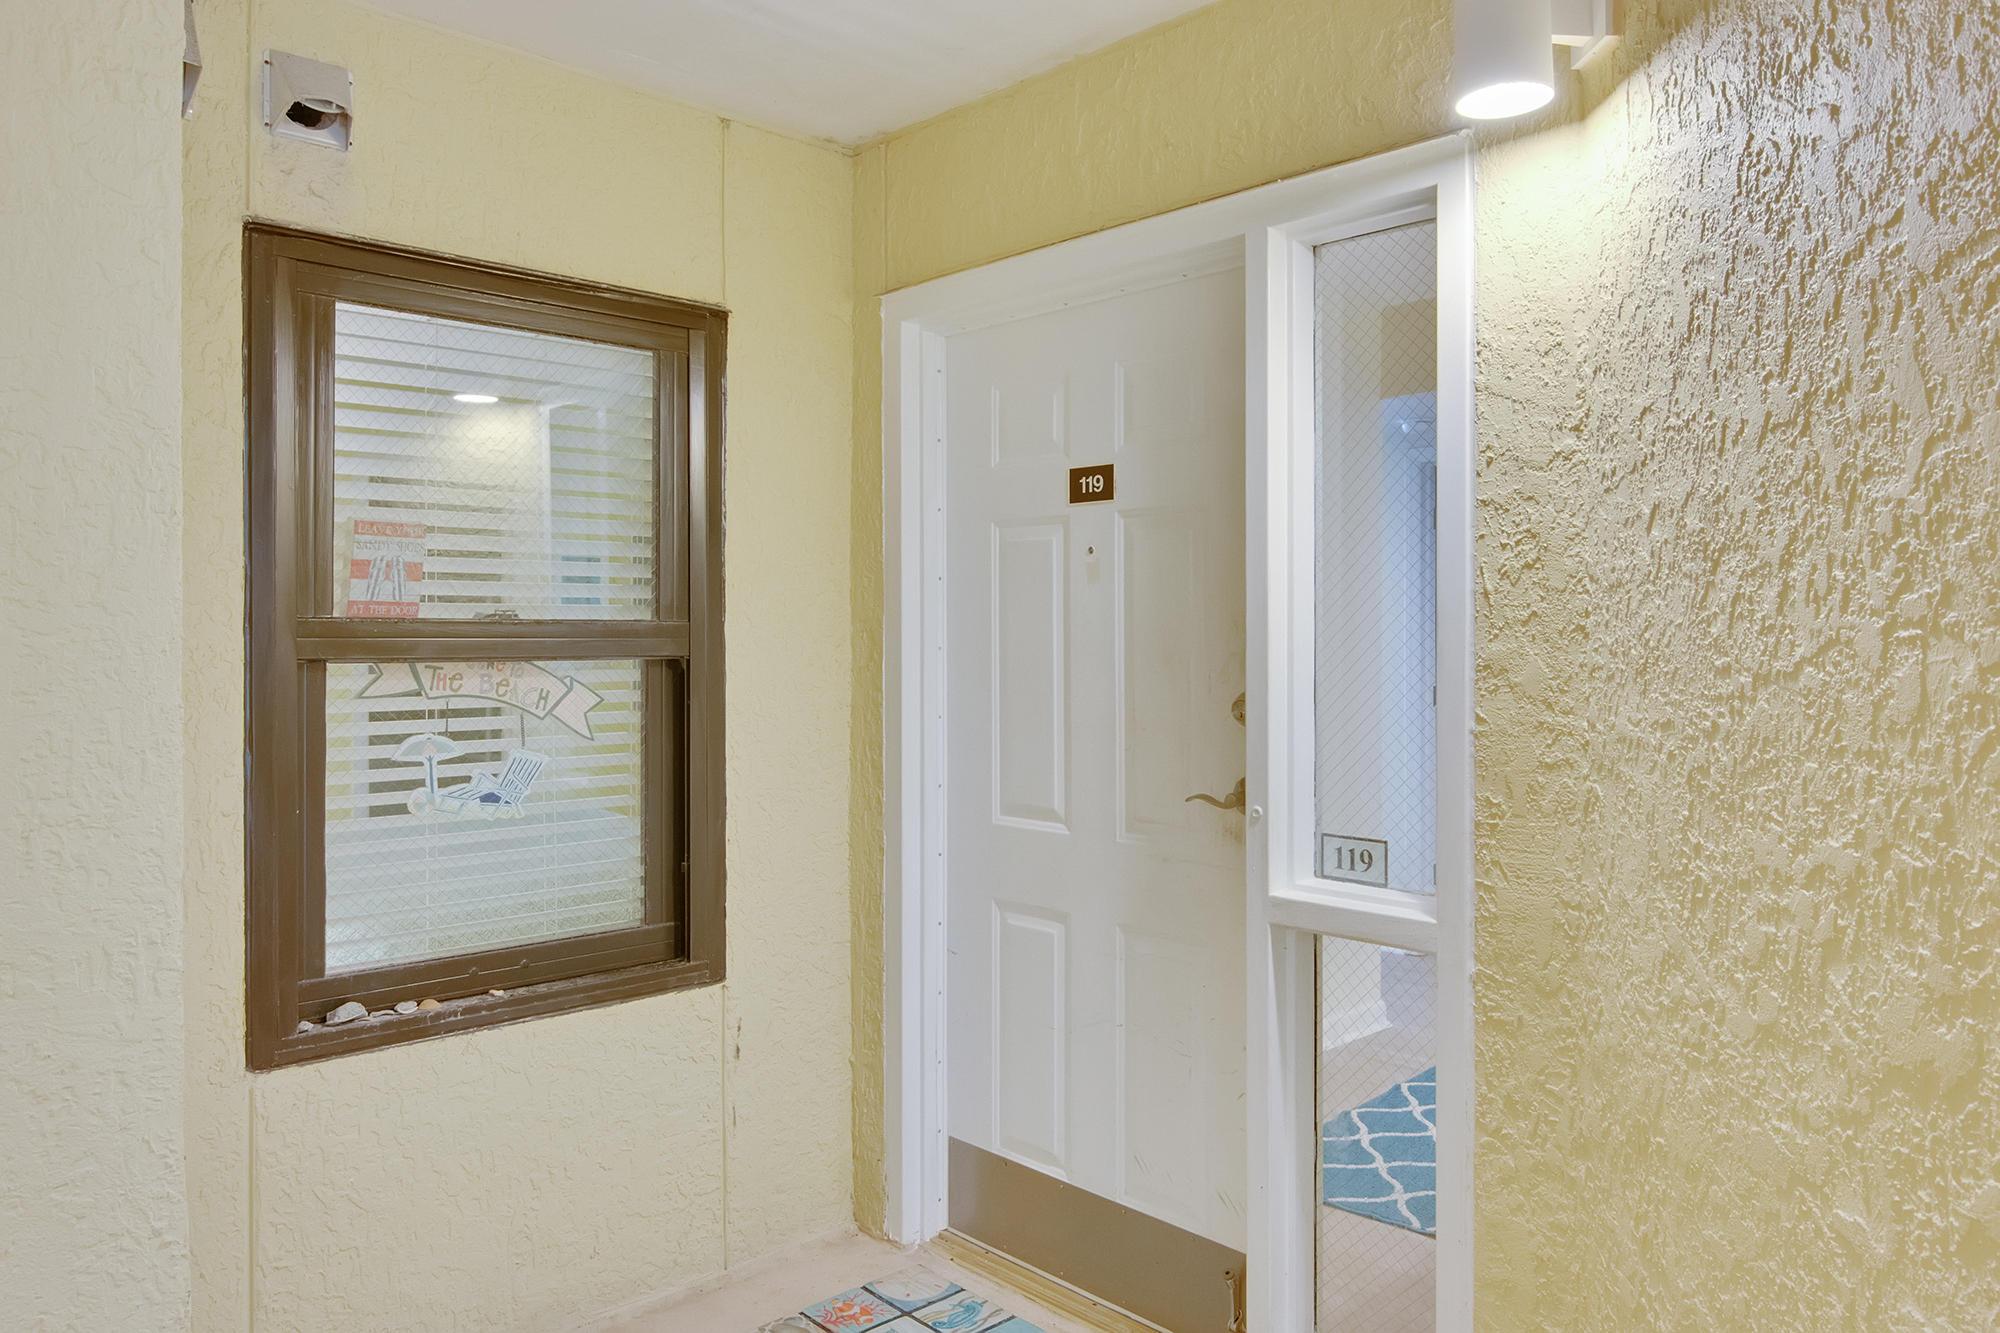 Charleston Oceanfront Villas Homes For Sale - 201 Arctic, Folly Beach, SC - 6